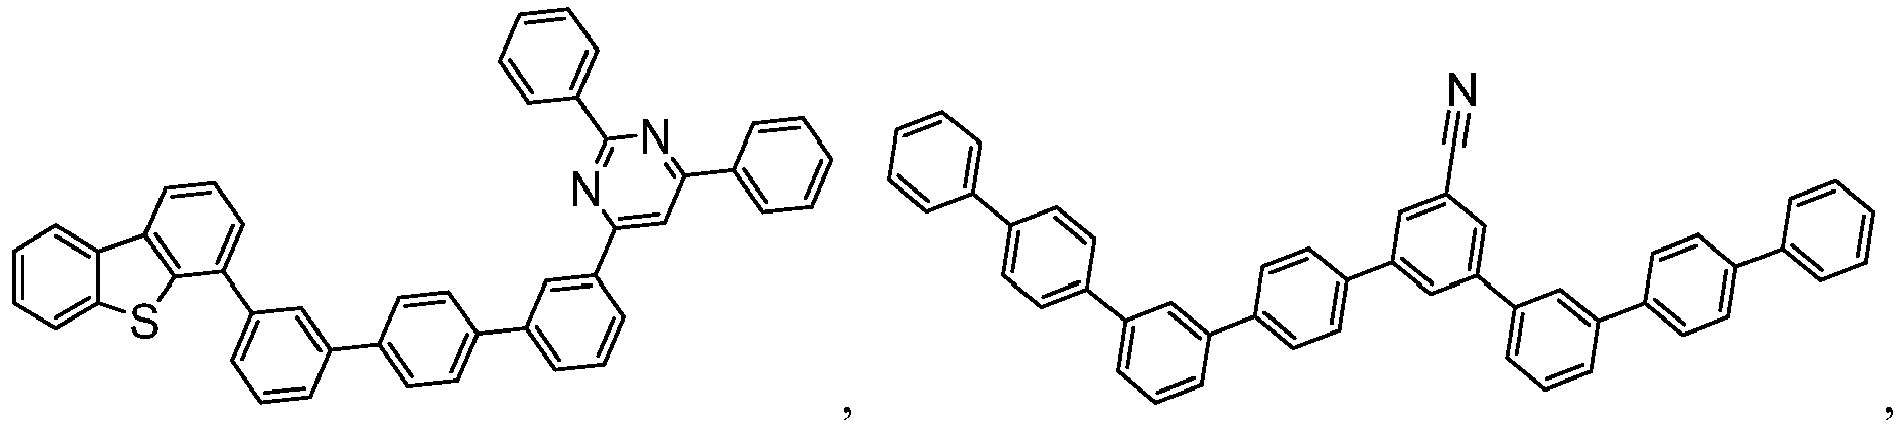 Figure imgb0904